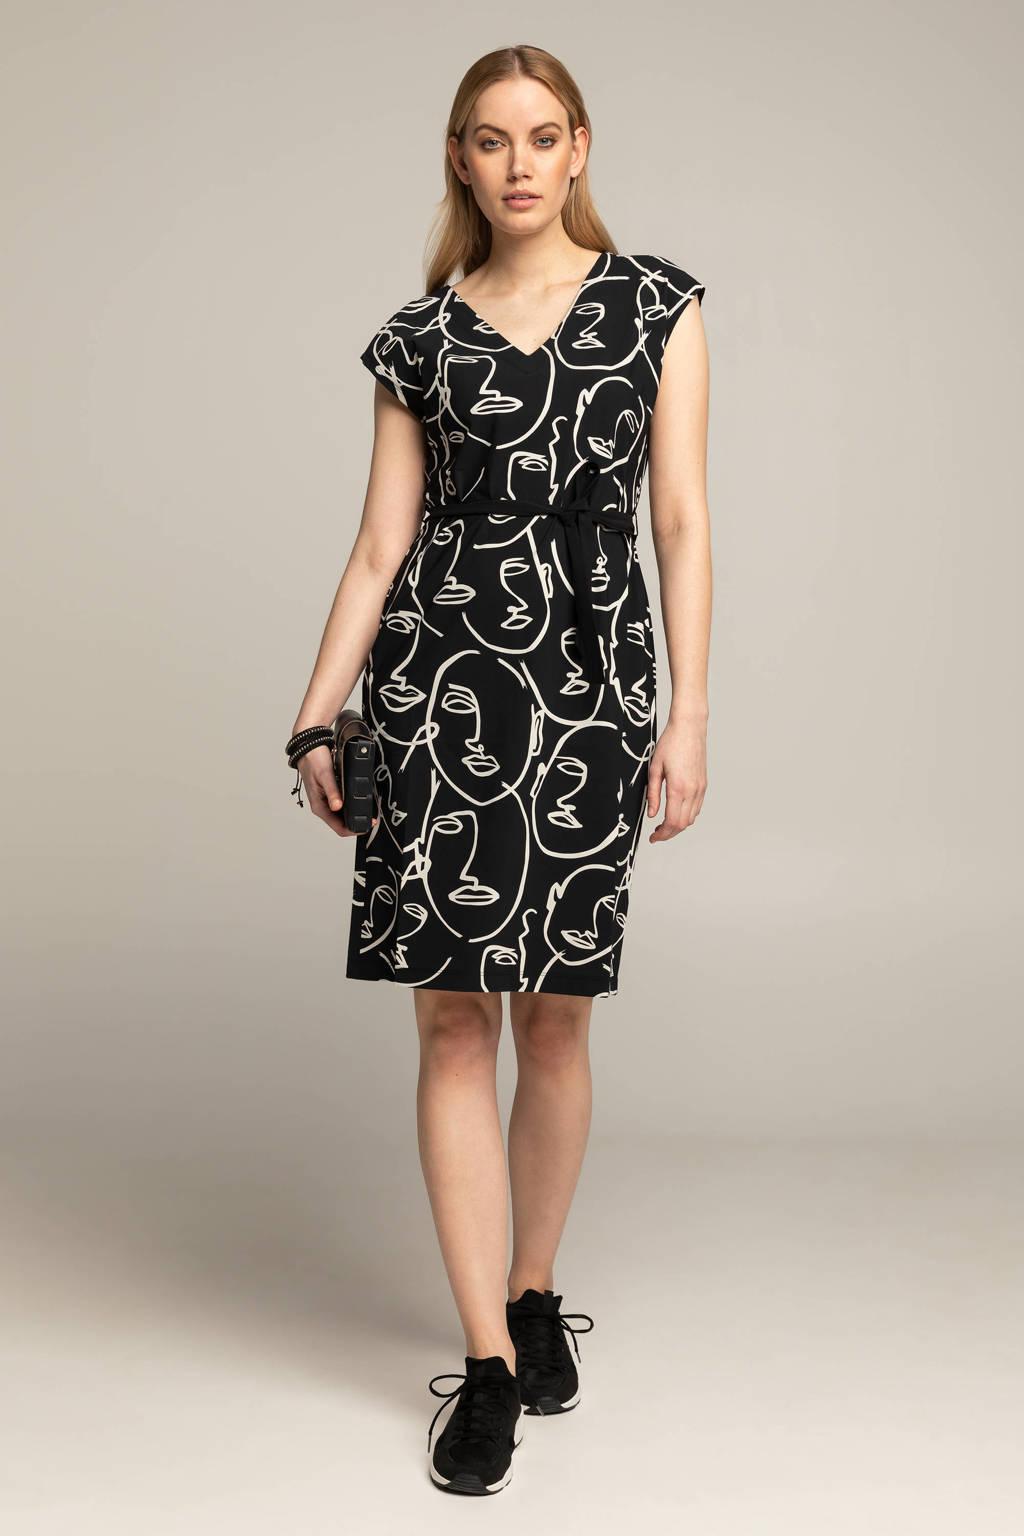 Expresso jurk BFARIKA met all over print zwart/wit, Zwart/wit